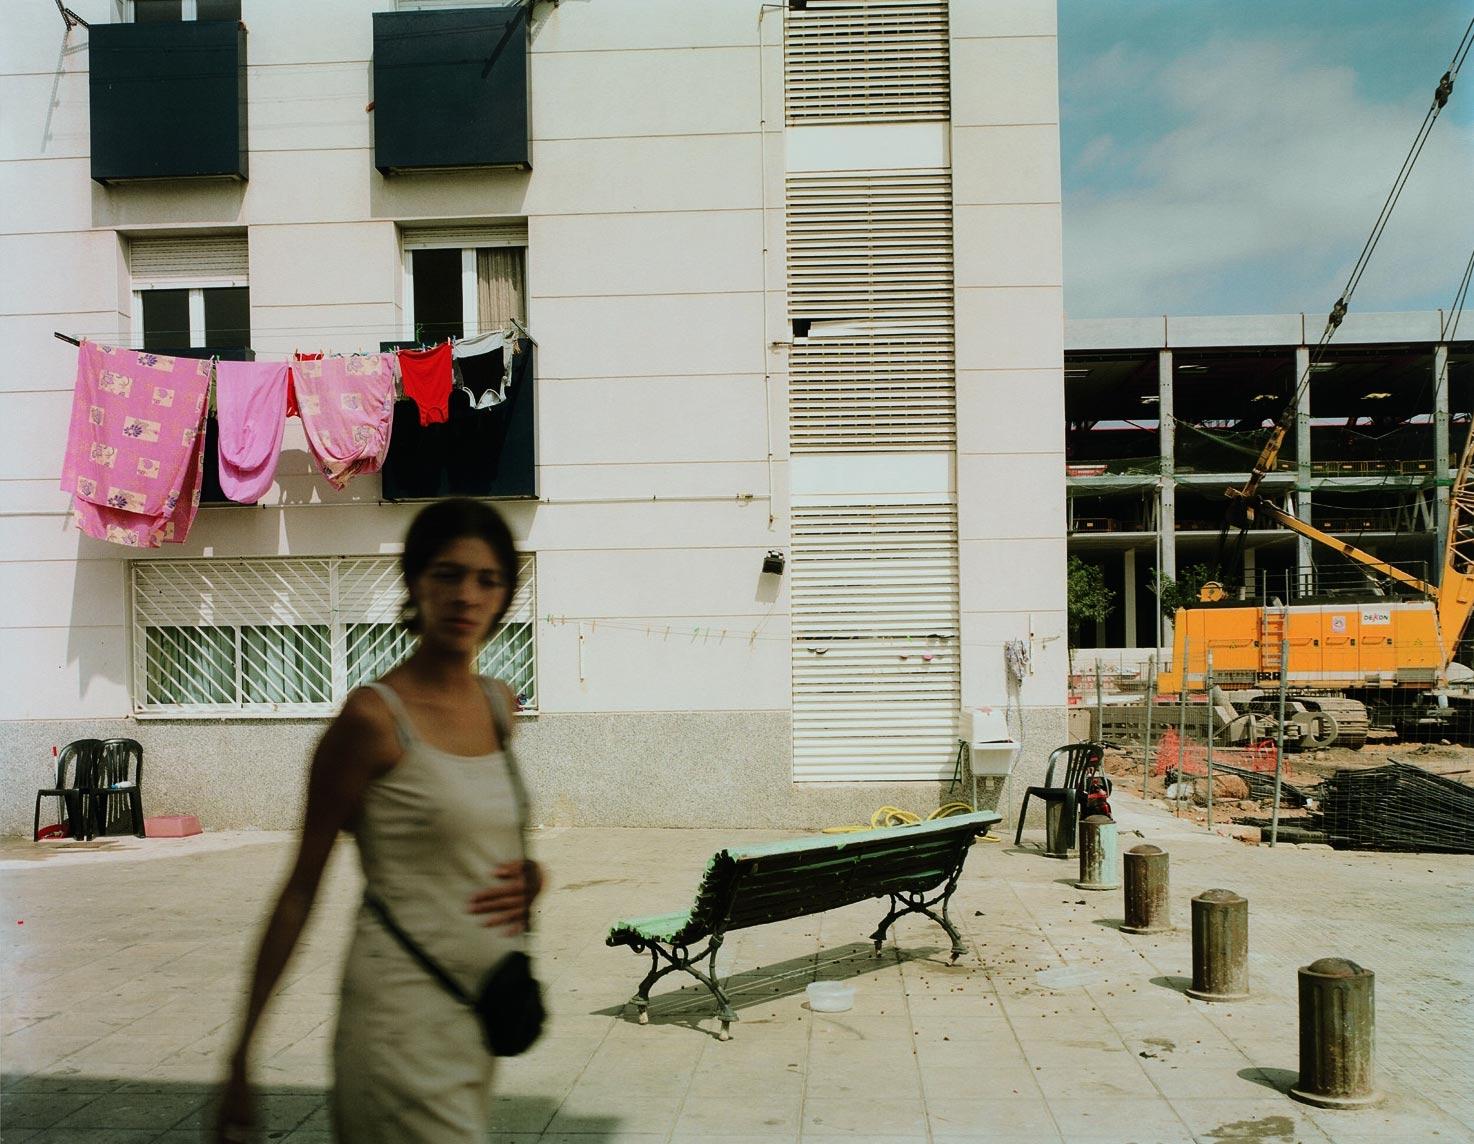 Barcelona's Successful Urban Model Neglected Peripheral Neighborhoods Like Sant Cosme